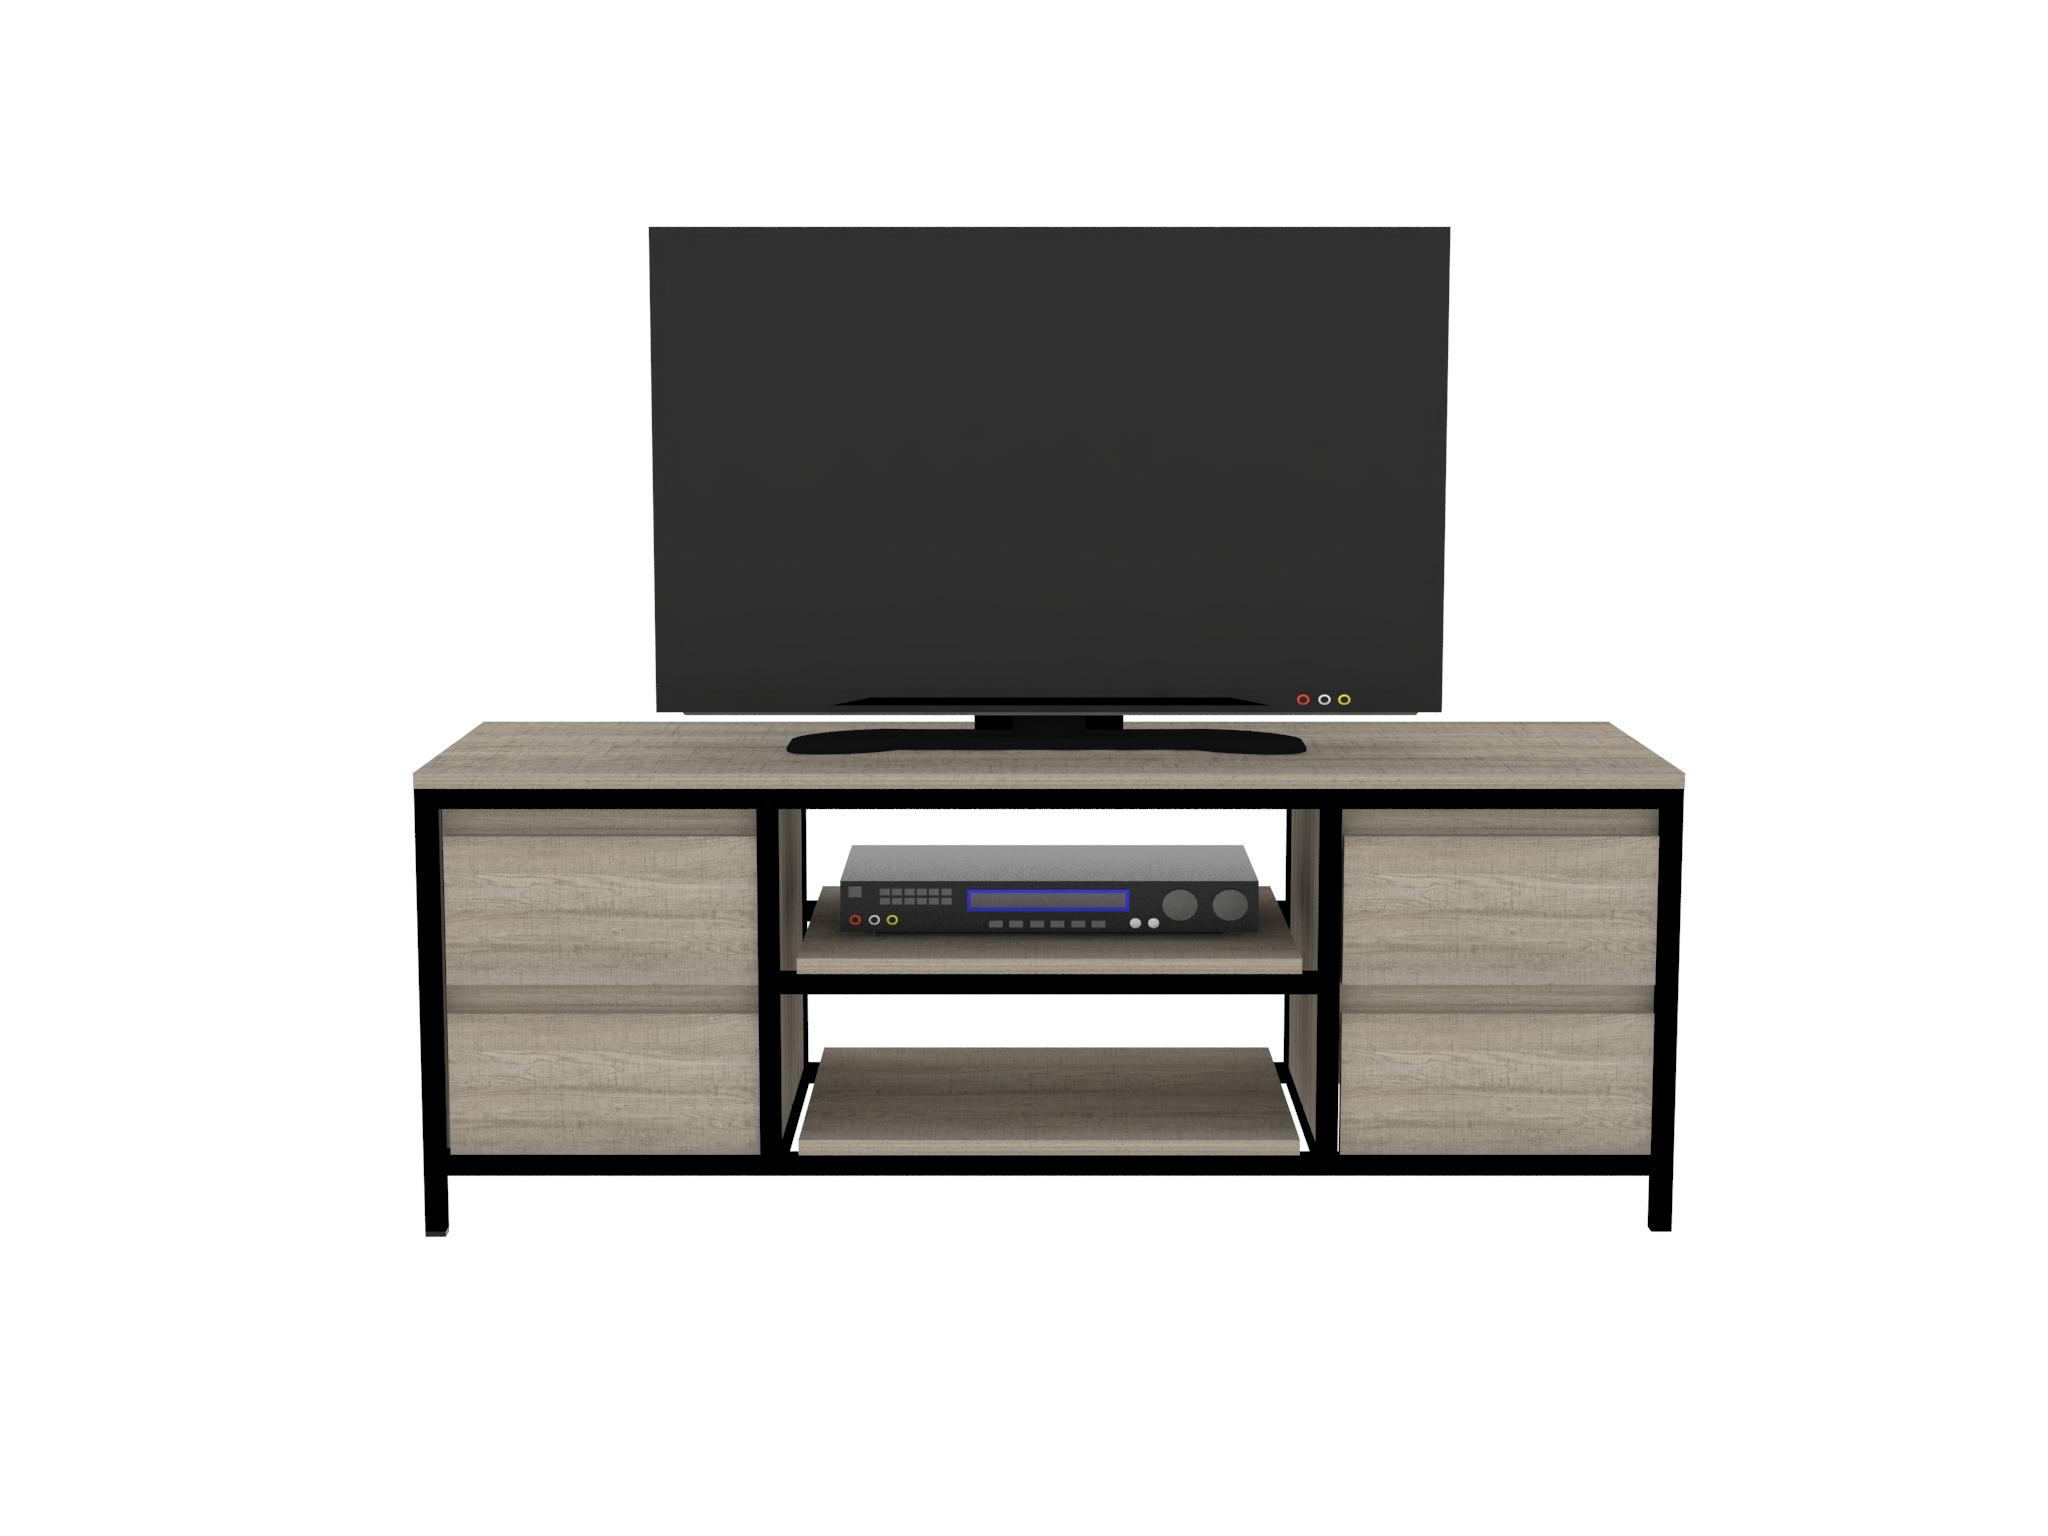 Video Rack VR-7530